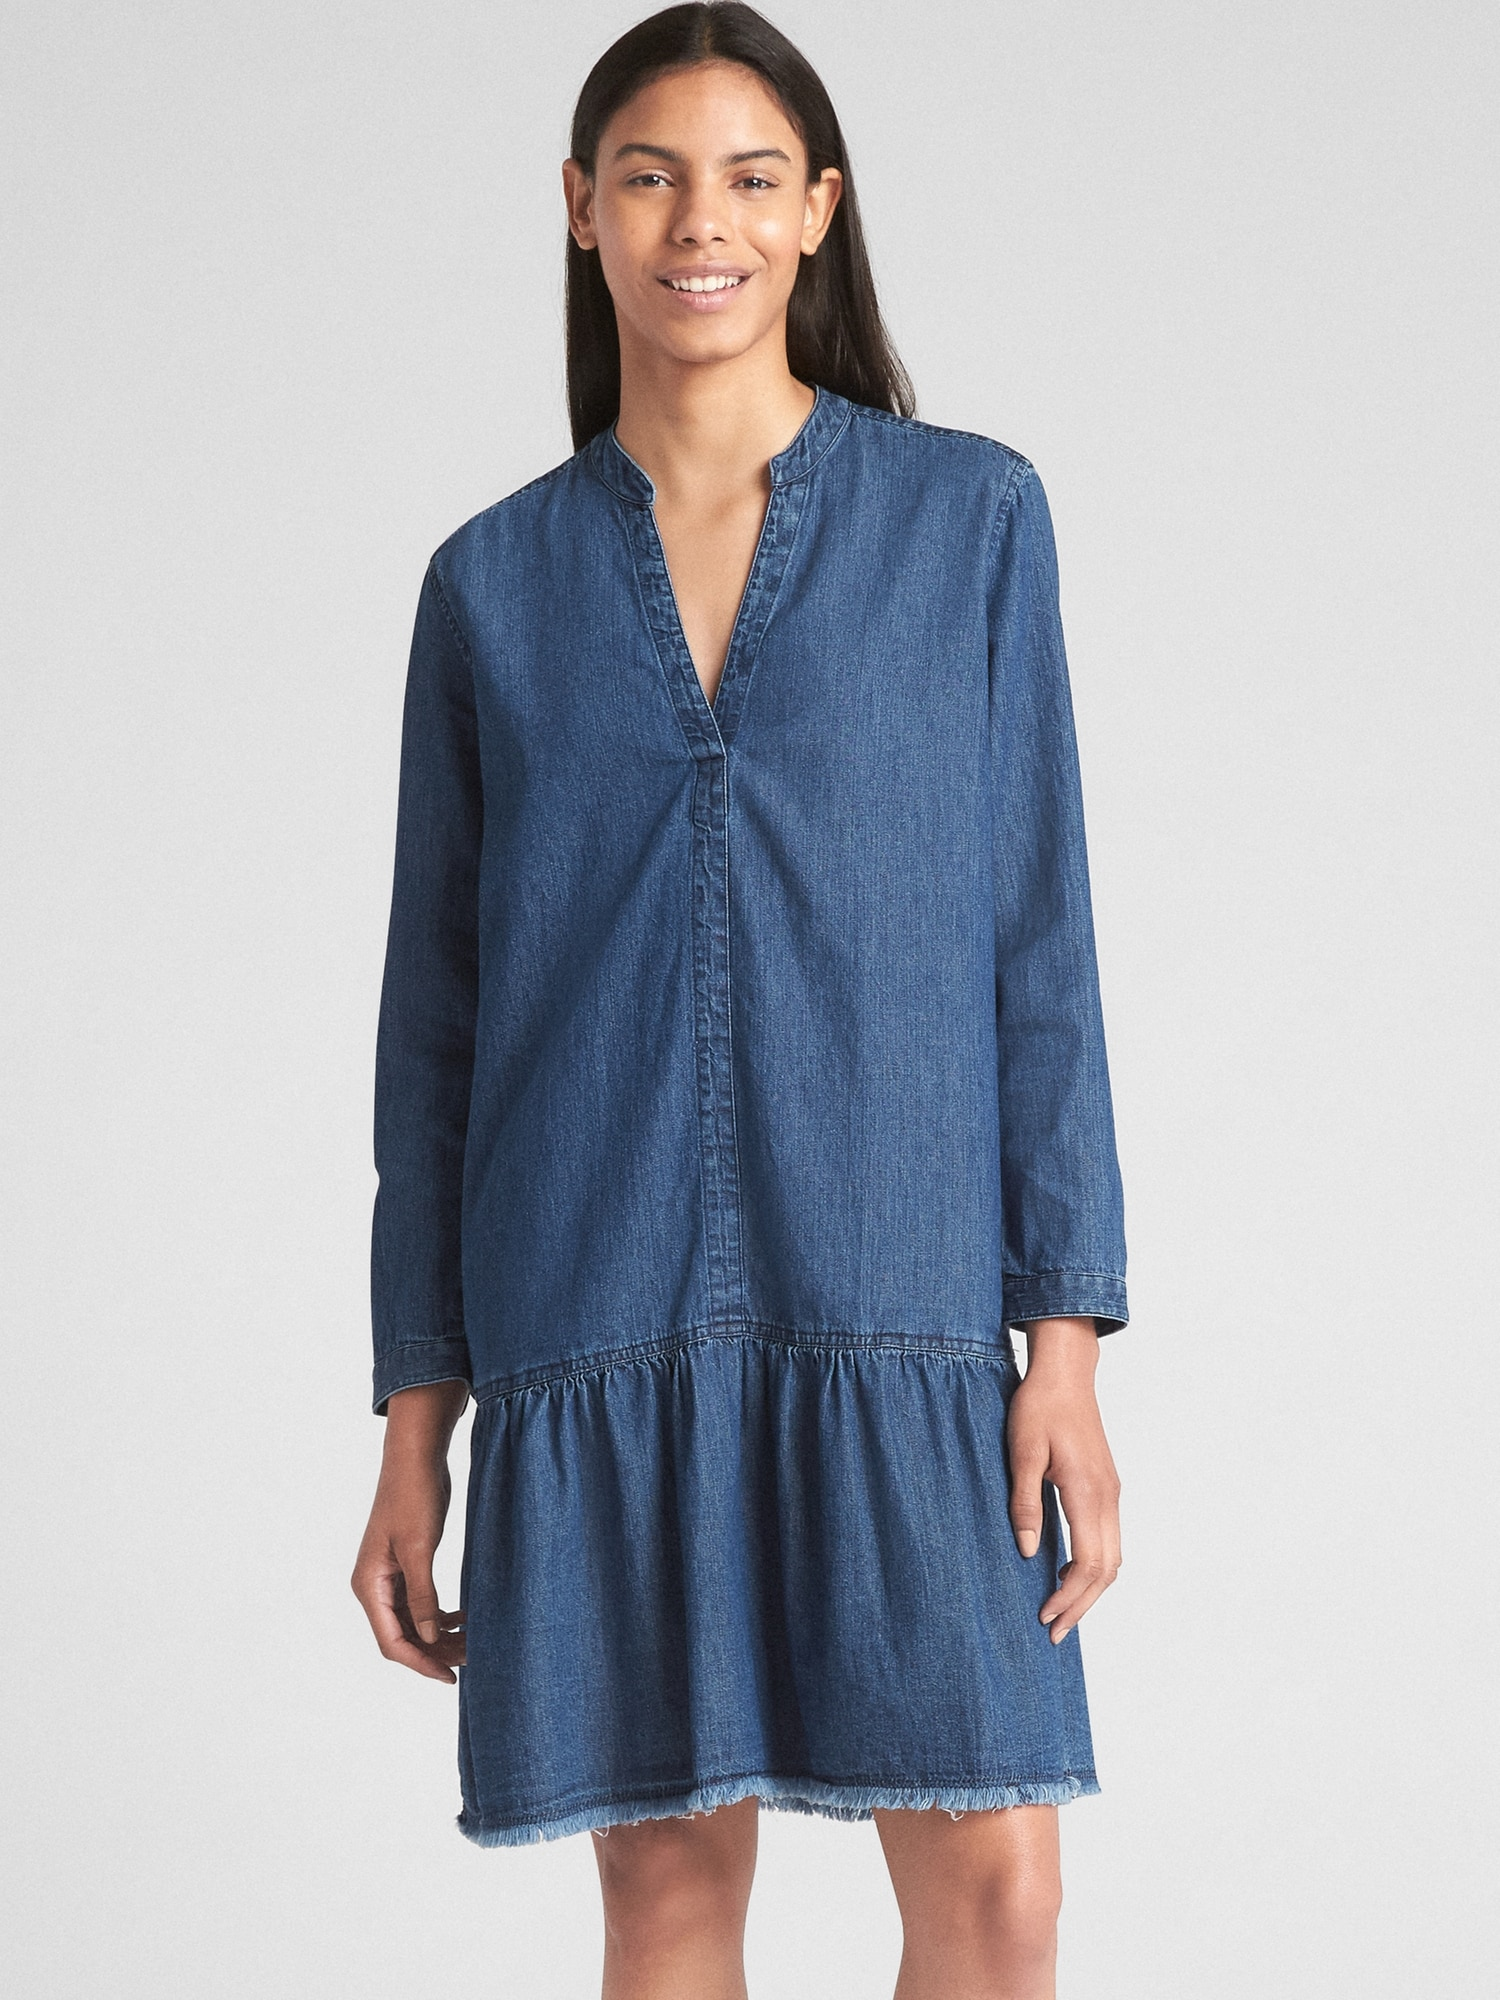 Long Sleeve Popover Drop Waist Dress In Denim